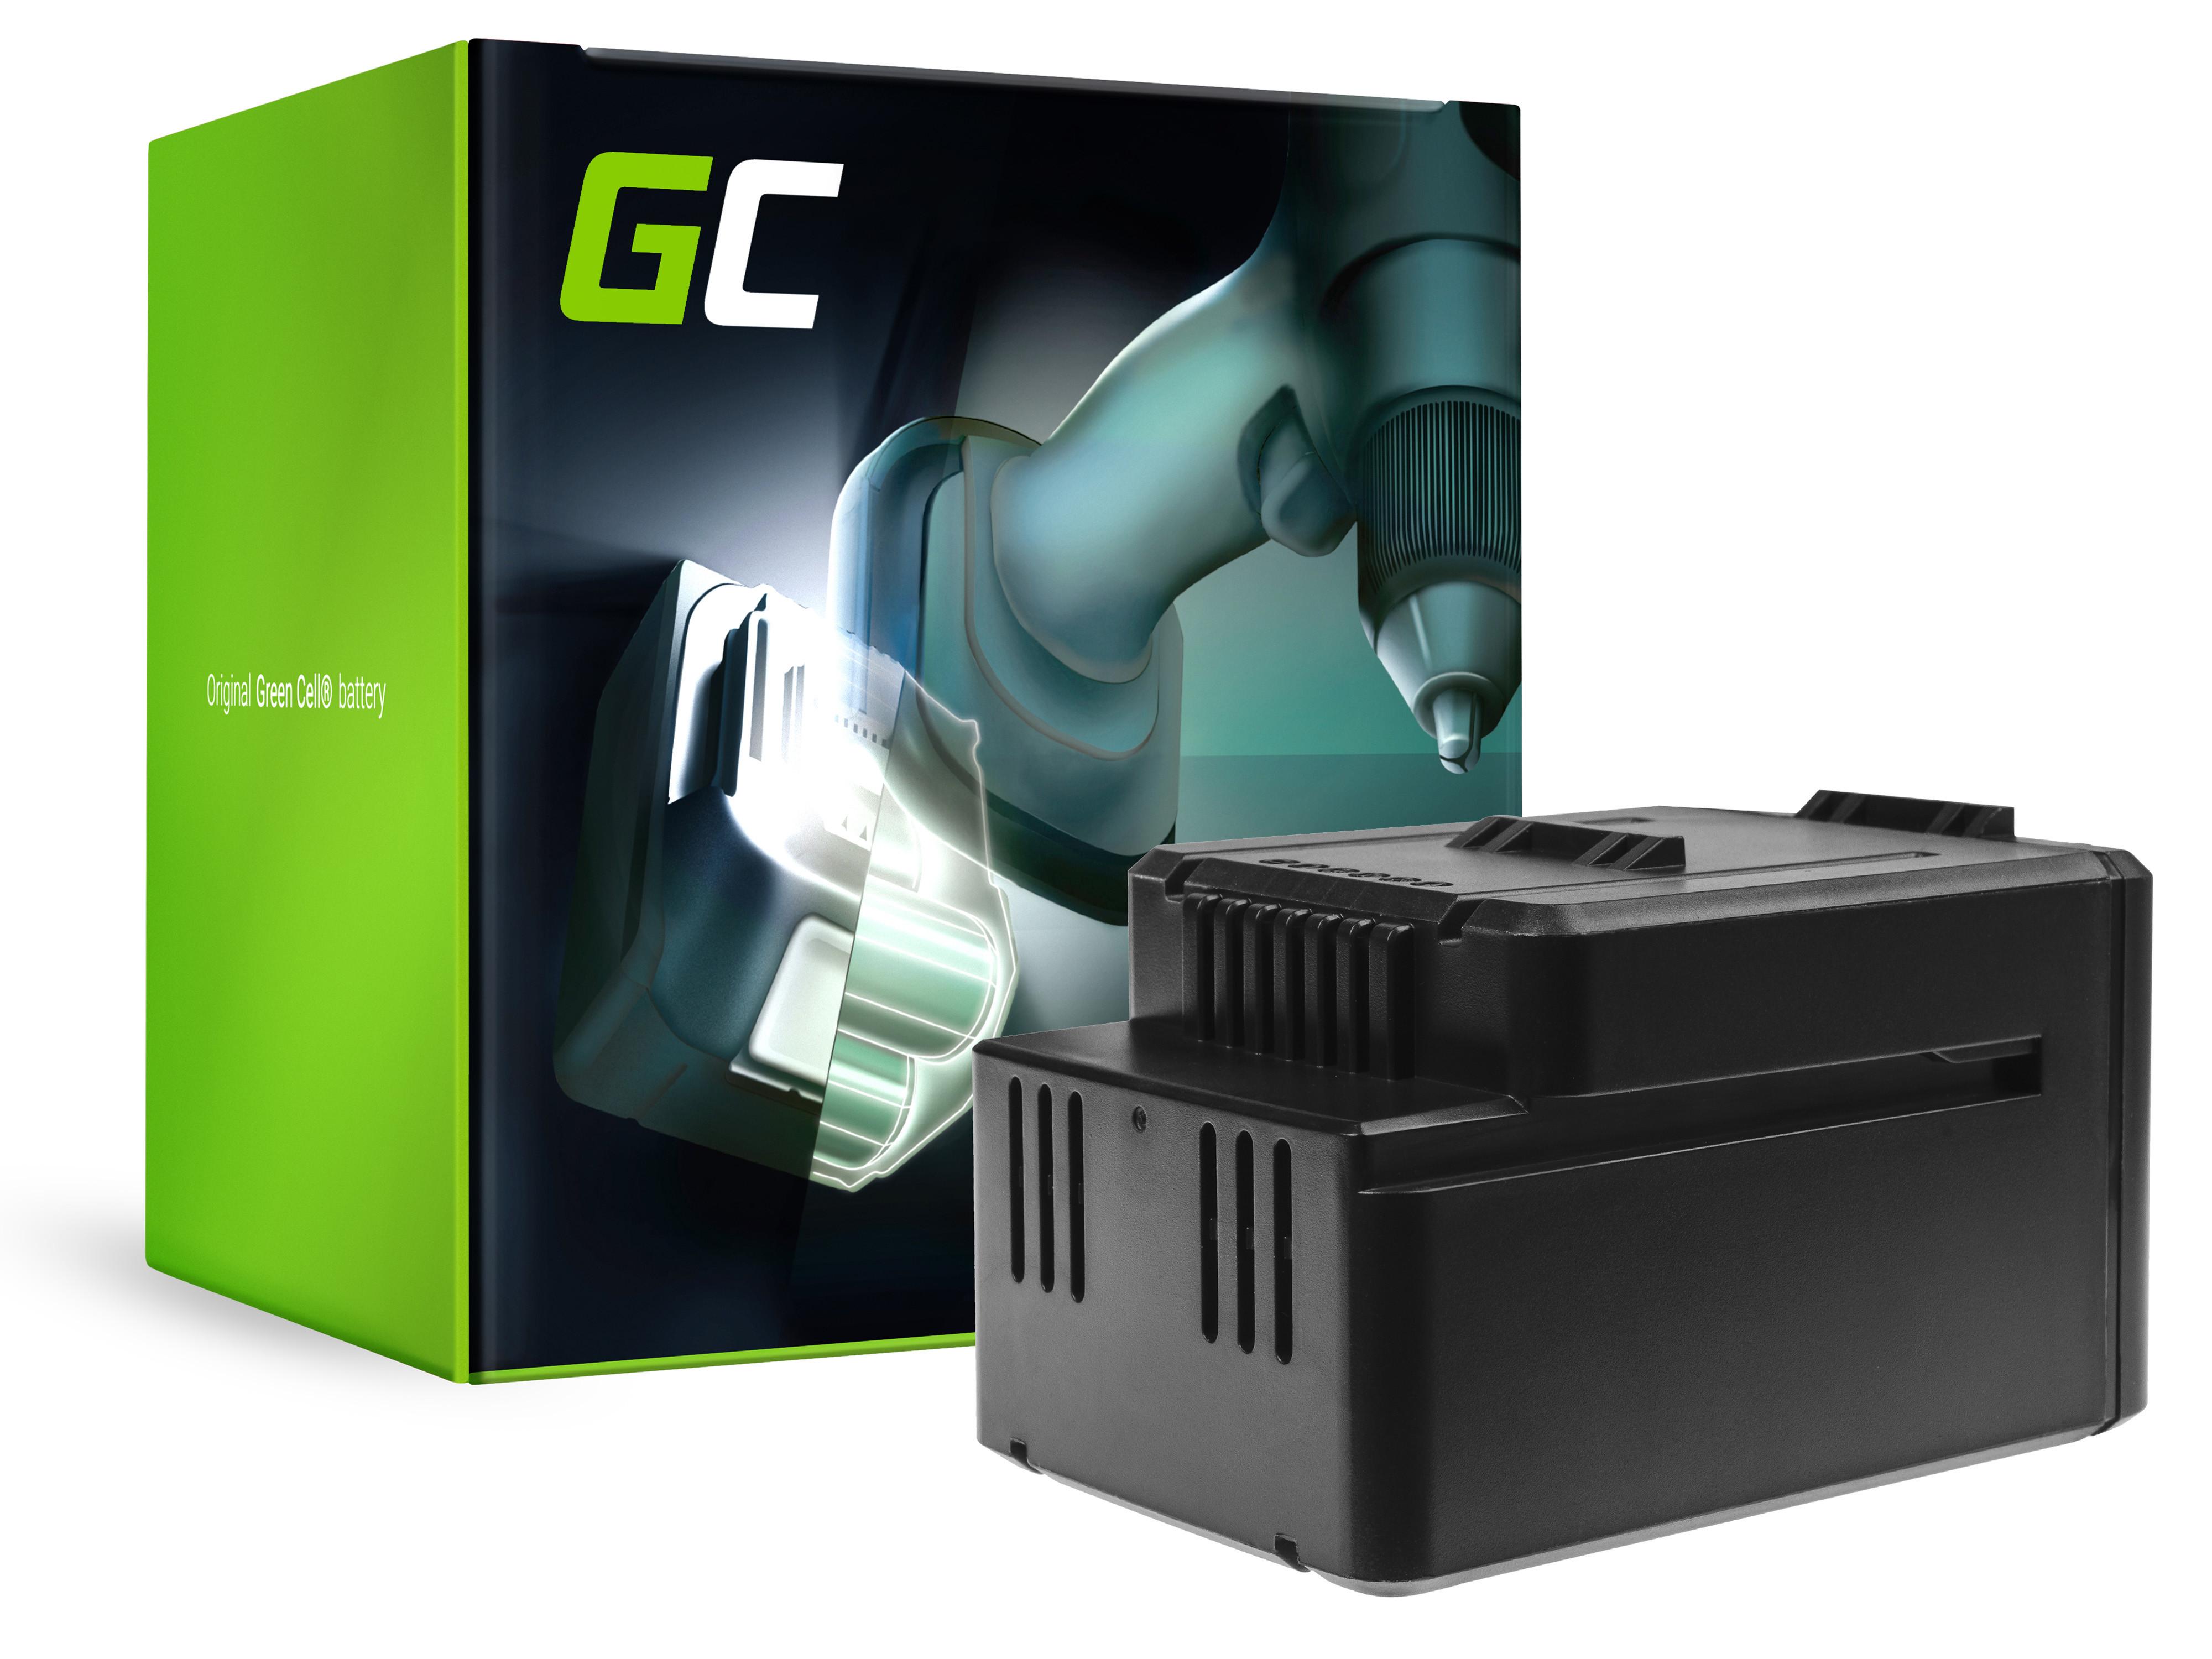 Baterie Green Cell WORX WA3536 WG770 WG770E WG776 WG776E 40V 2000 mAh Li-ion - neoriginální